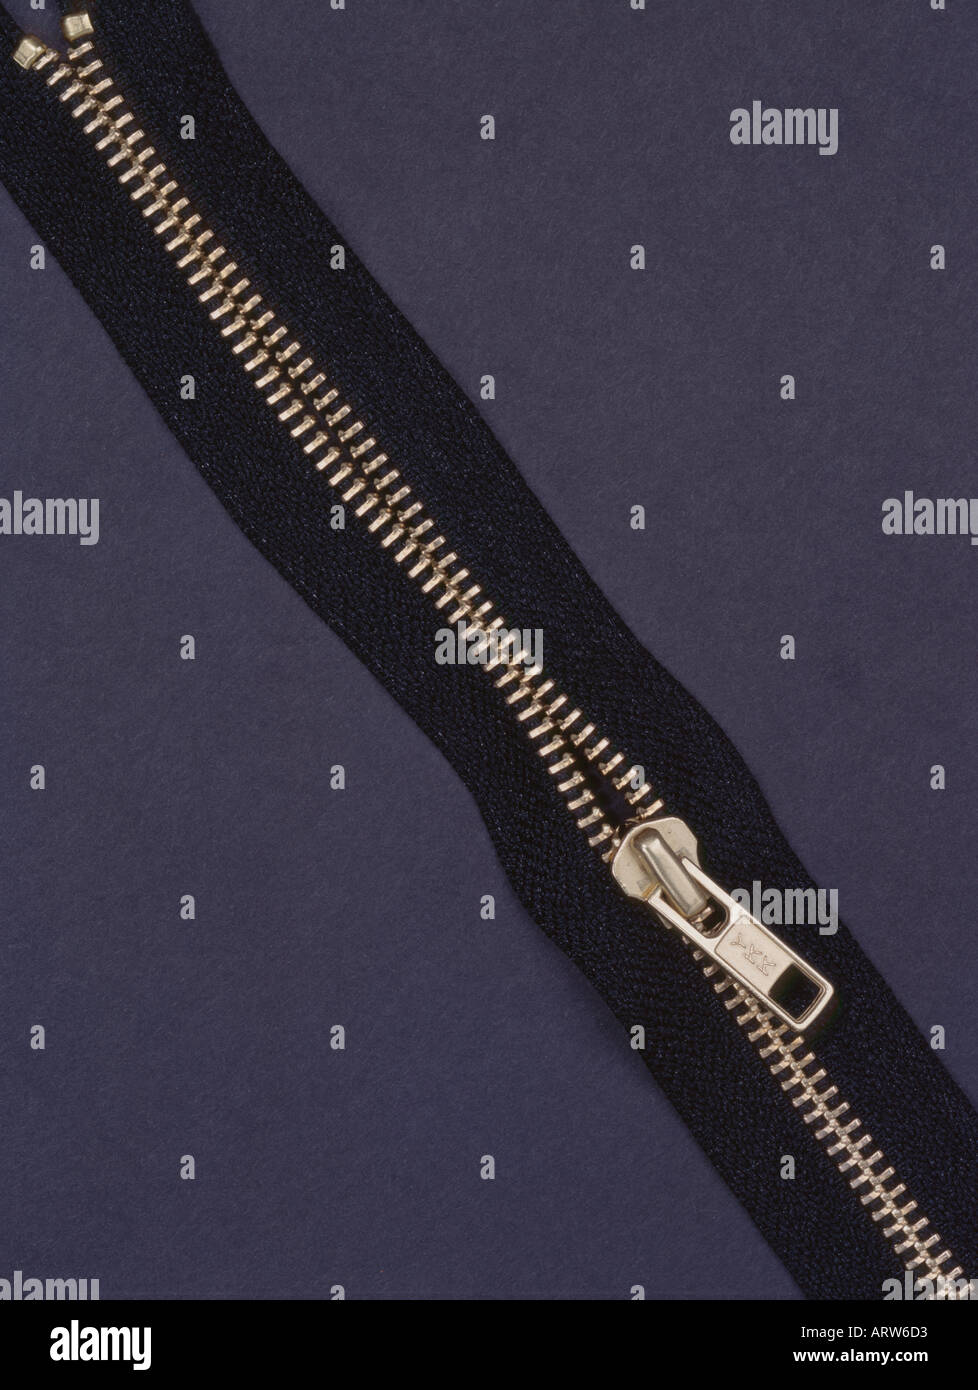 Brass zipper against black background - Stock Image